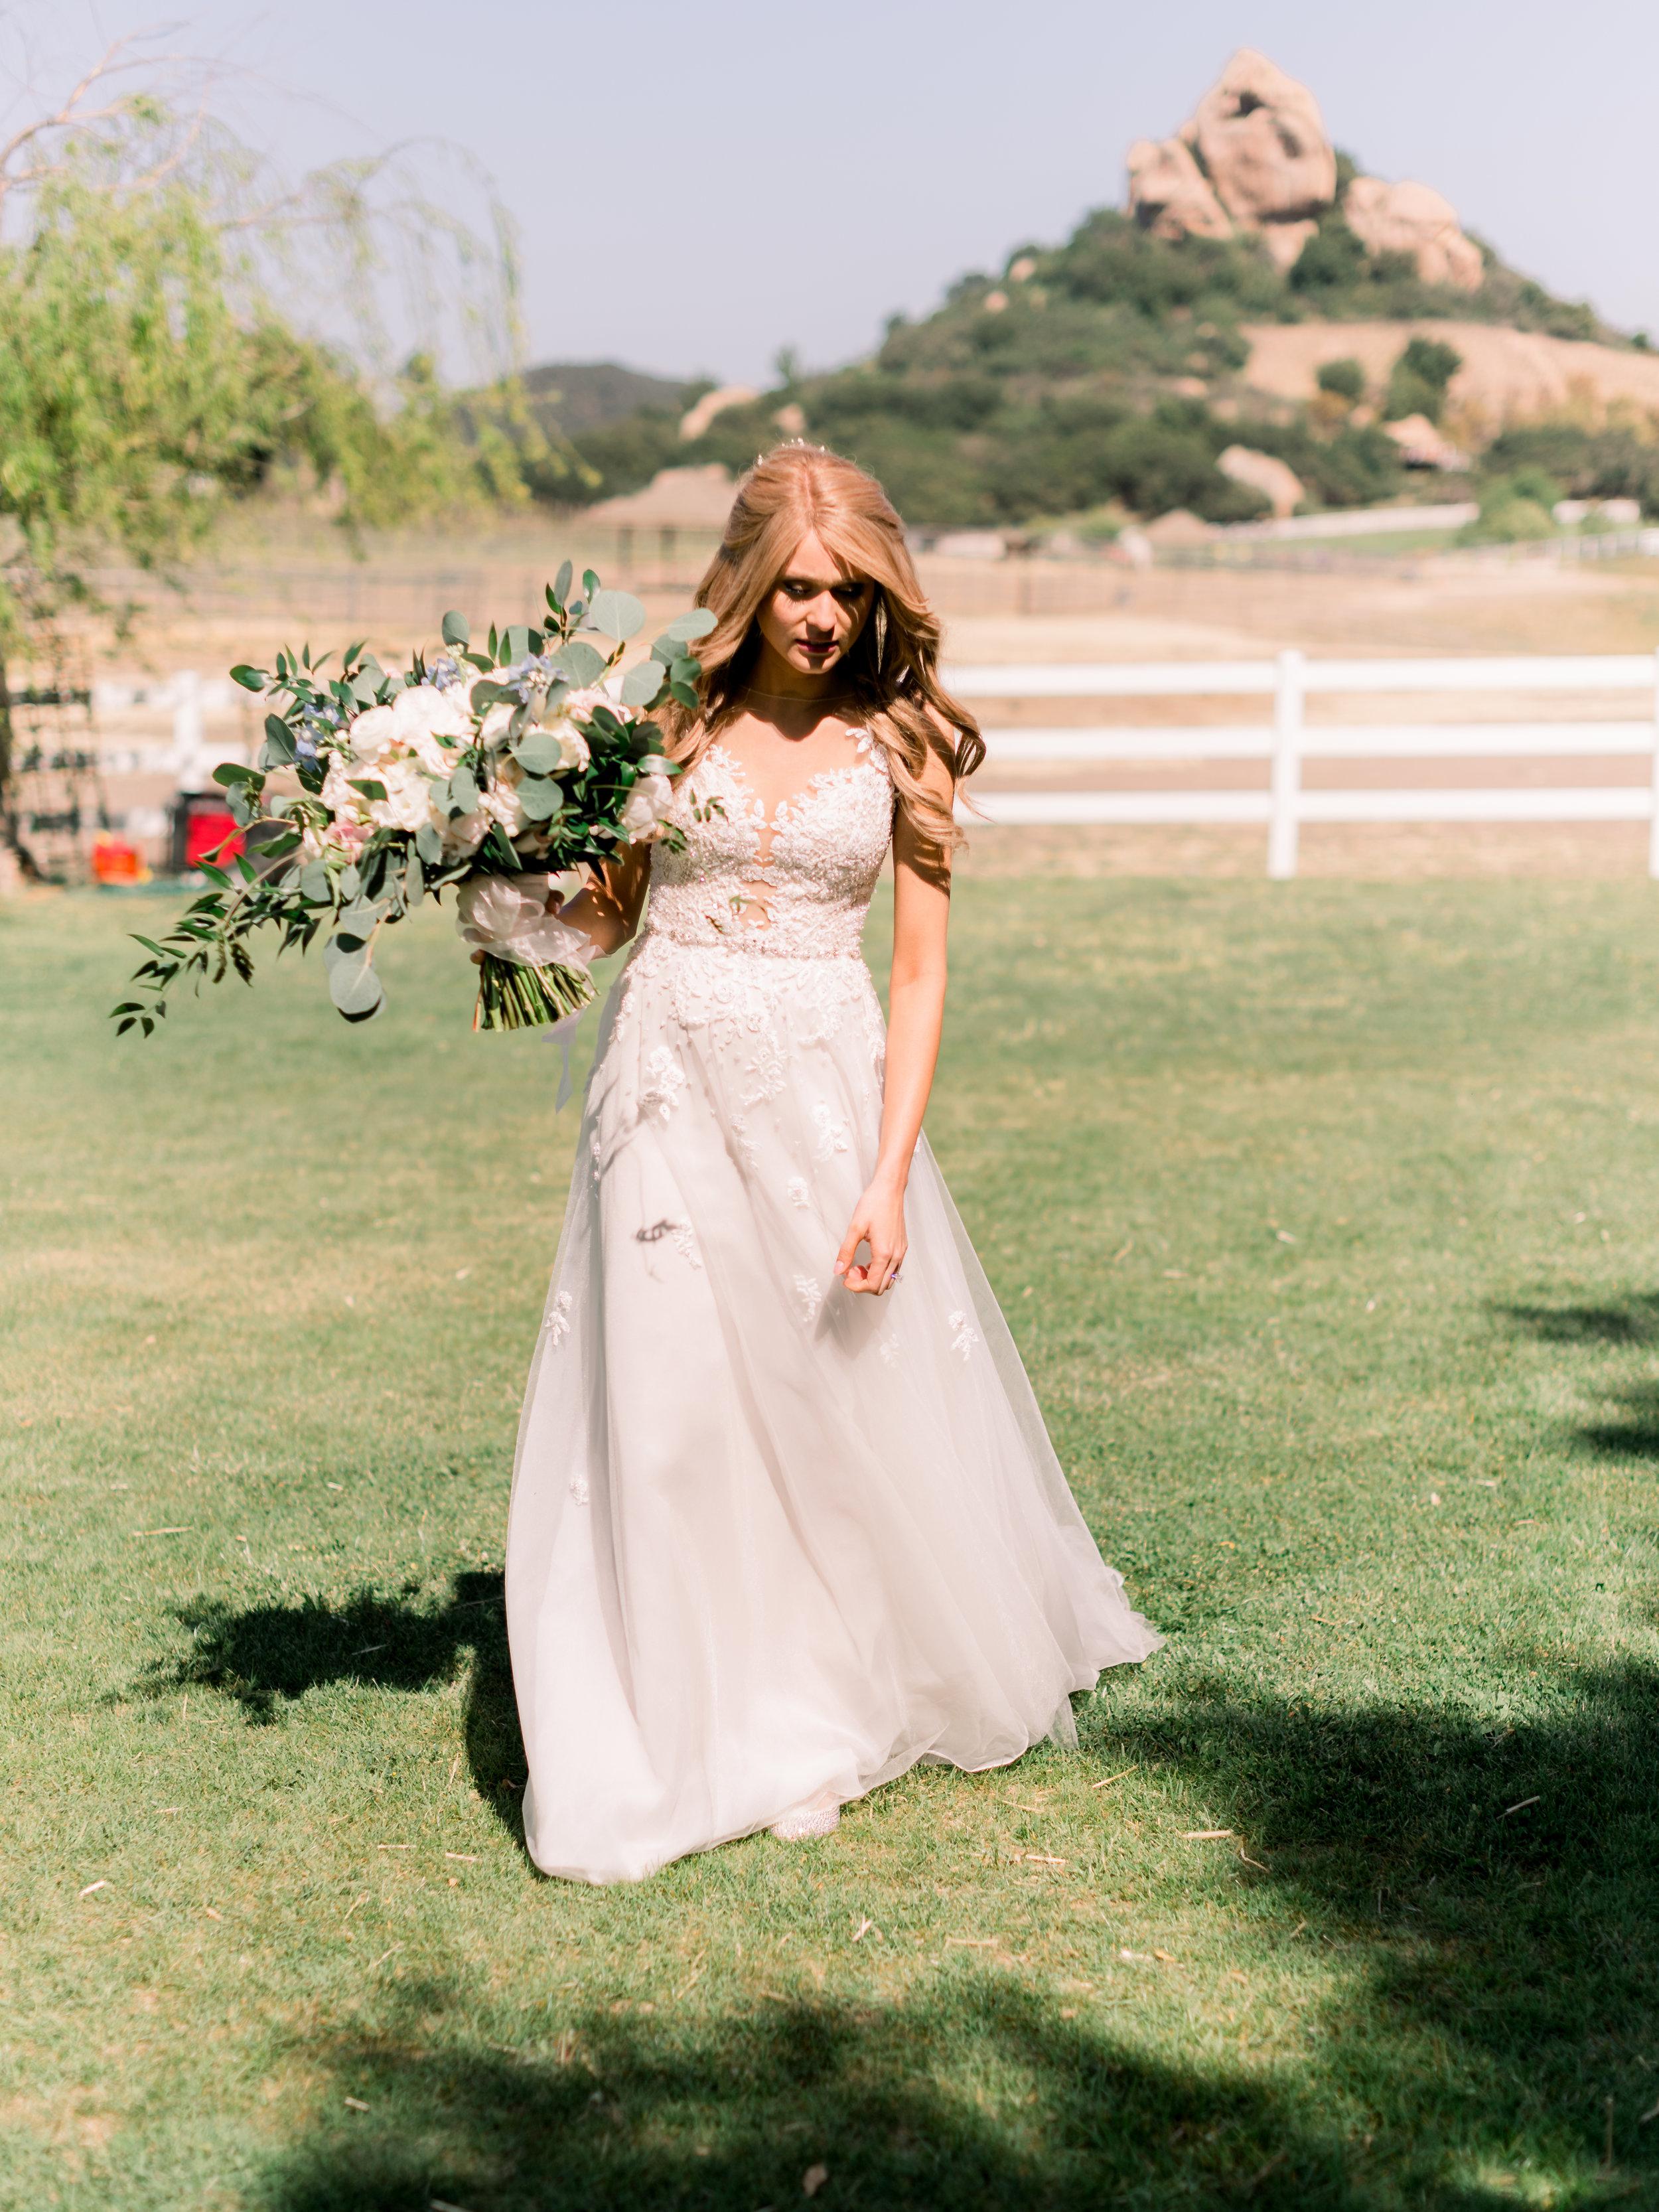 bride-strolling-through-the-wedding-venue-grounds.jpg